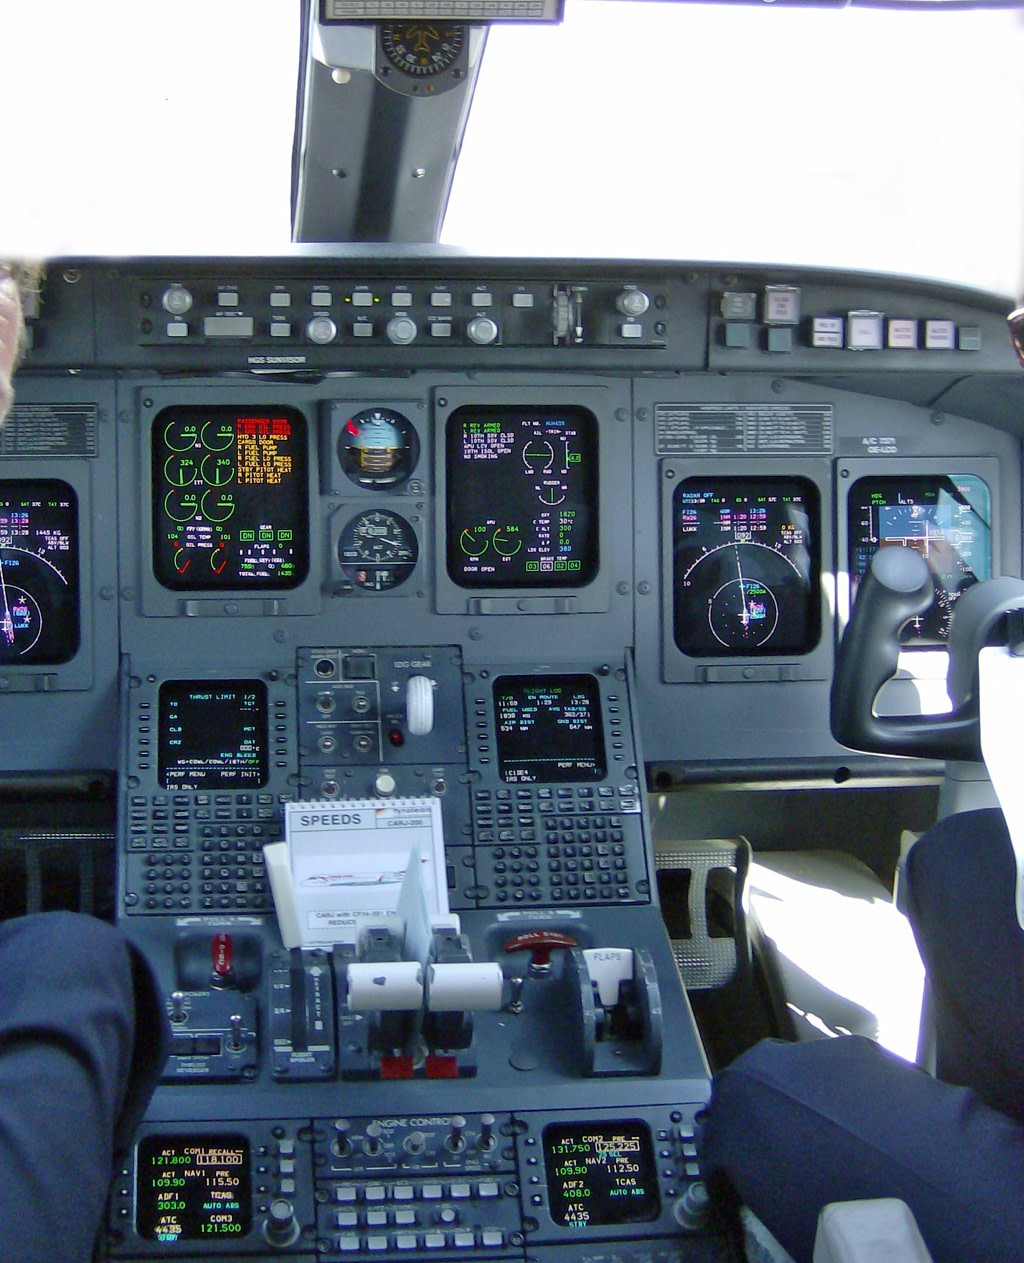 Austrian Arrows Canadair   CL-600-2B19 Regional Jet CRJ-200LR